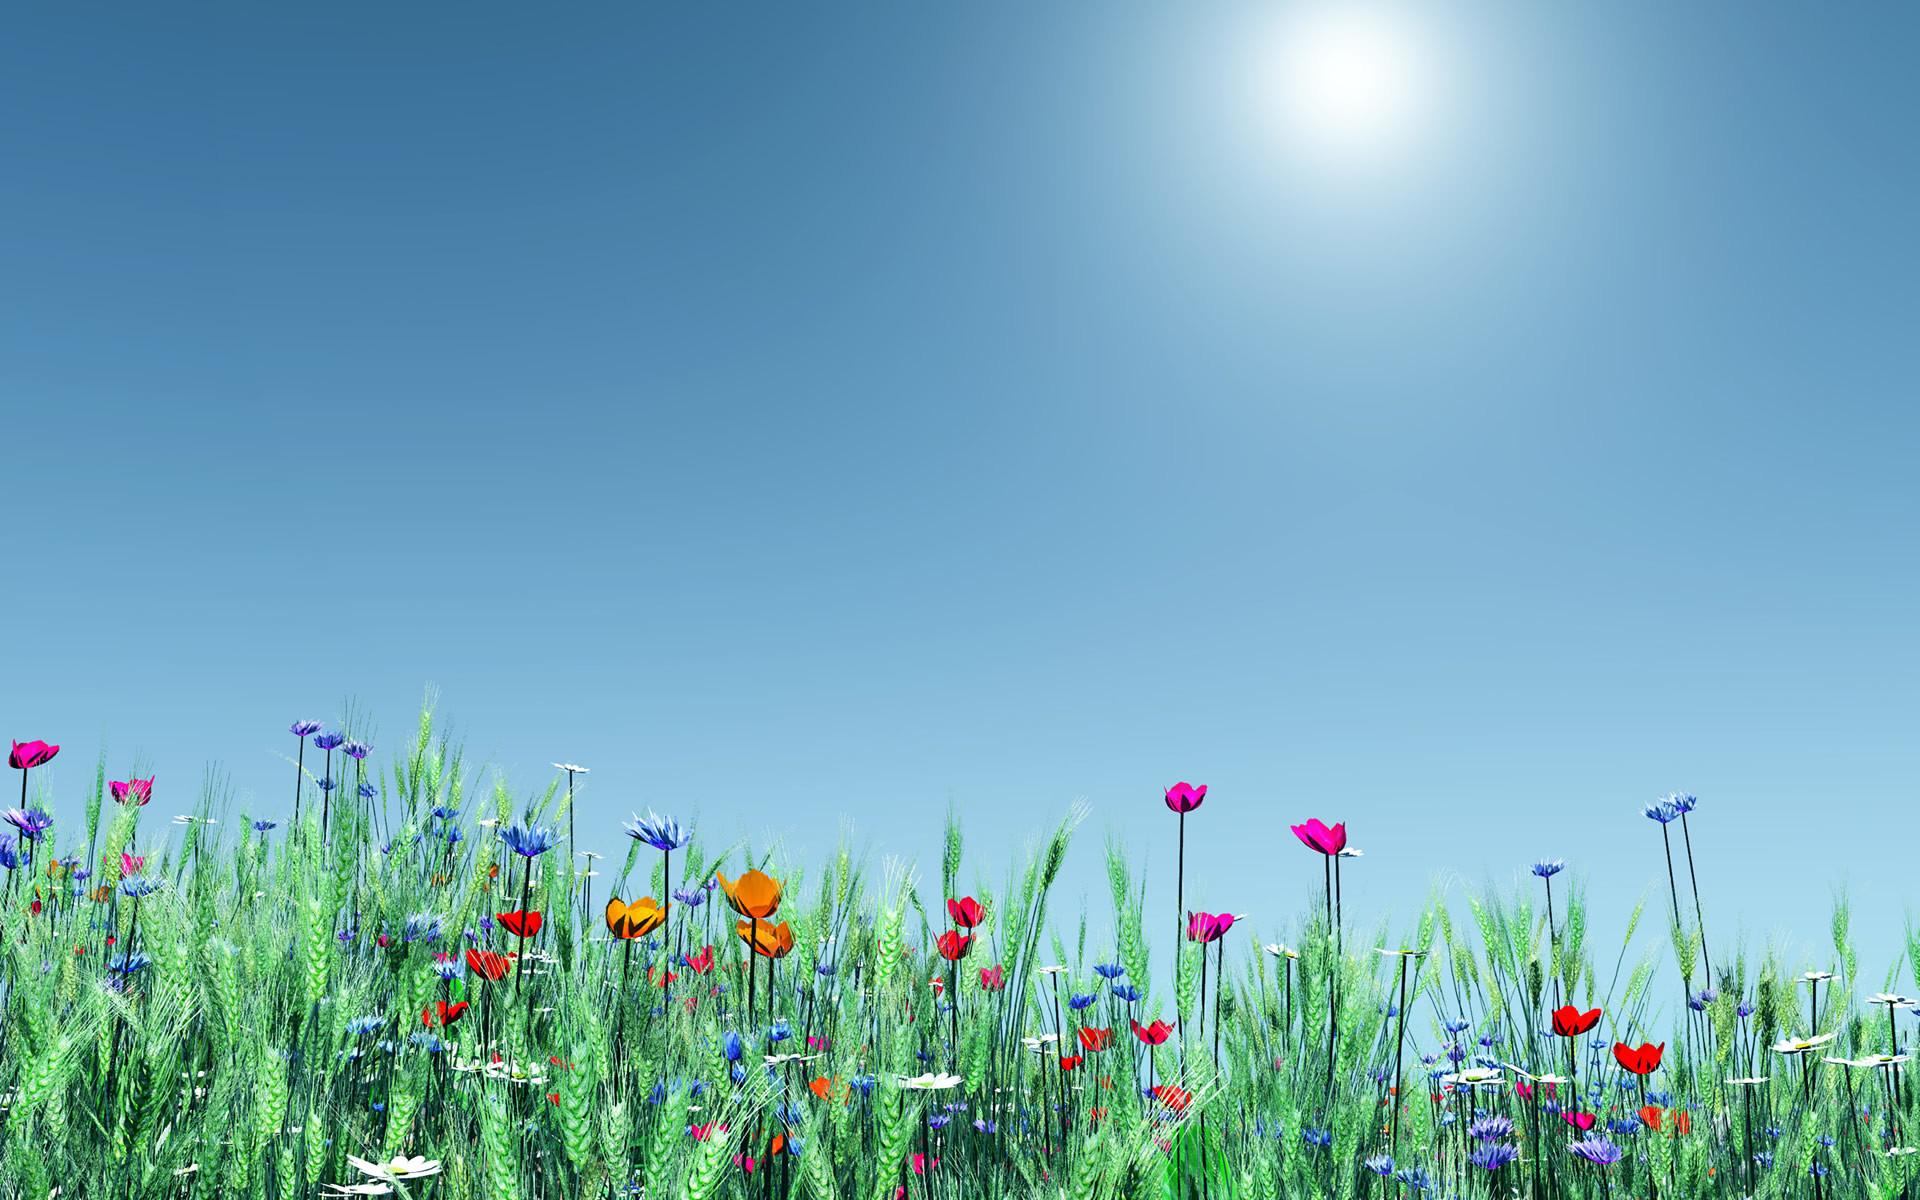 Spring flowers background desktop 66 pictures 1920x1200 spring flowers desktop mightylinksfo